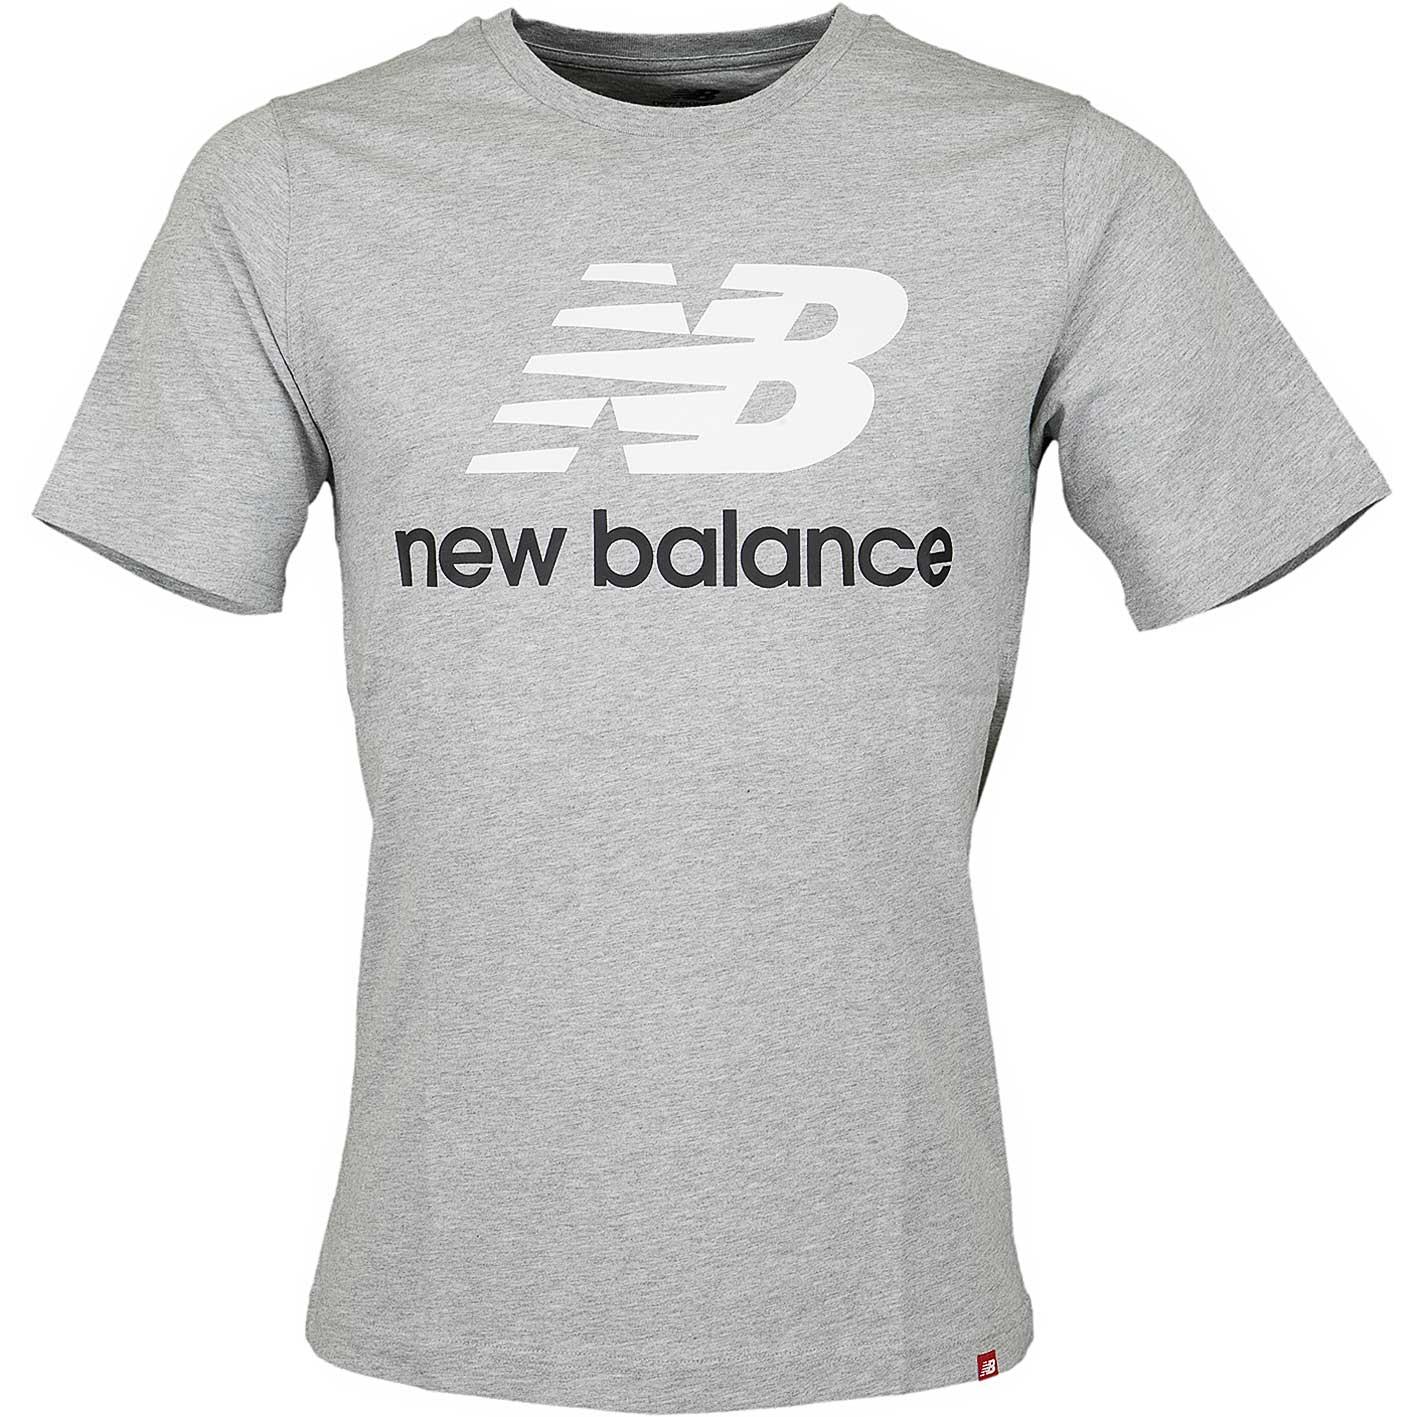 new balance t shirt grau